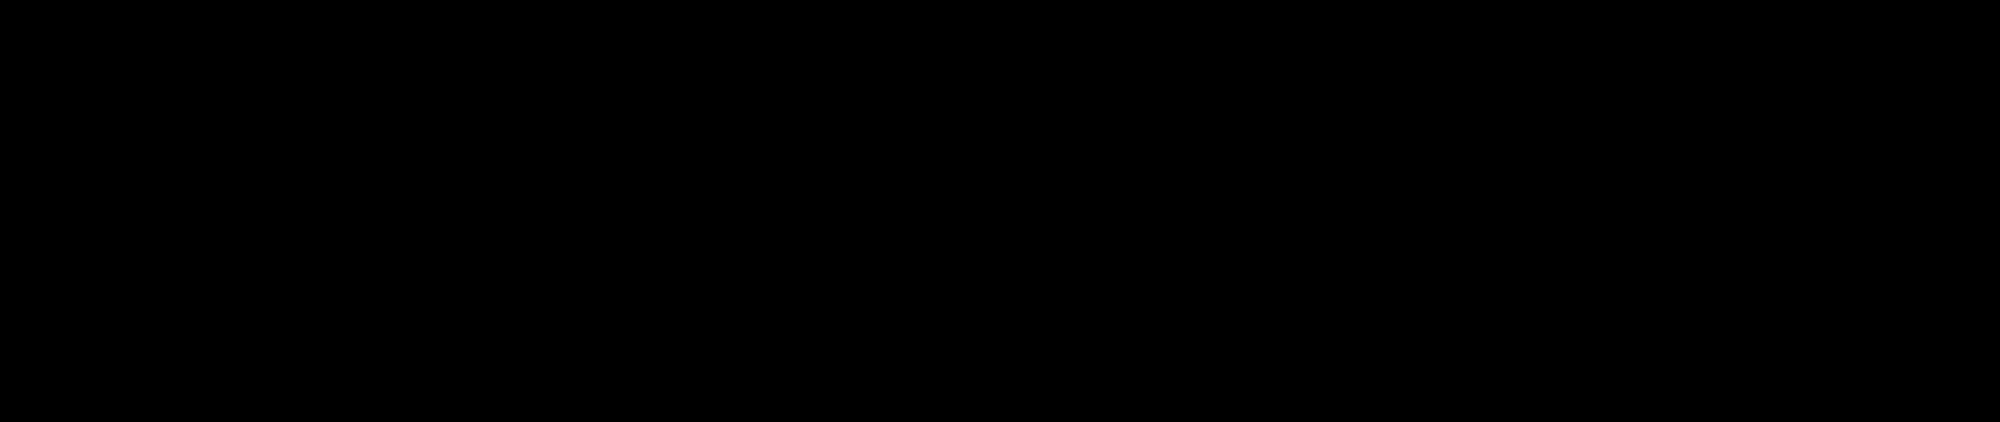 File logo svg wikimedia. Oreo clipart android